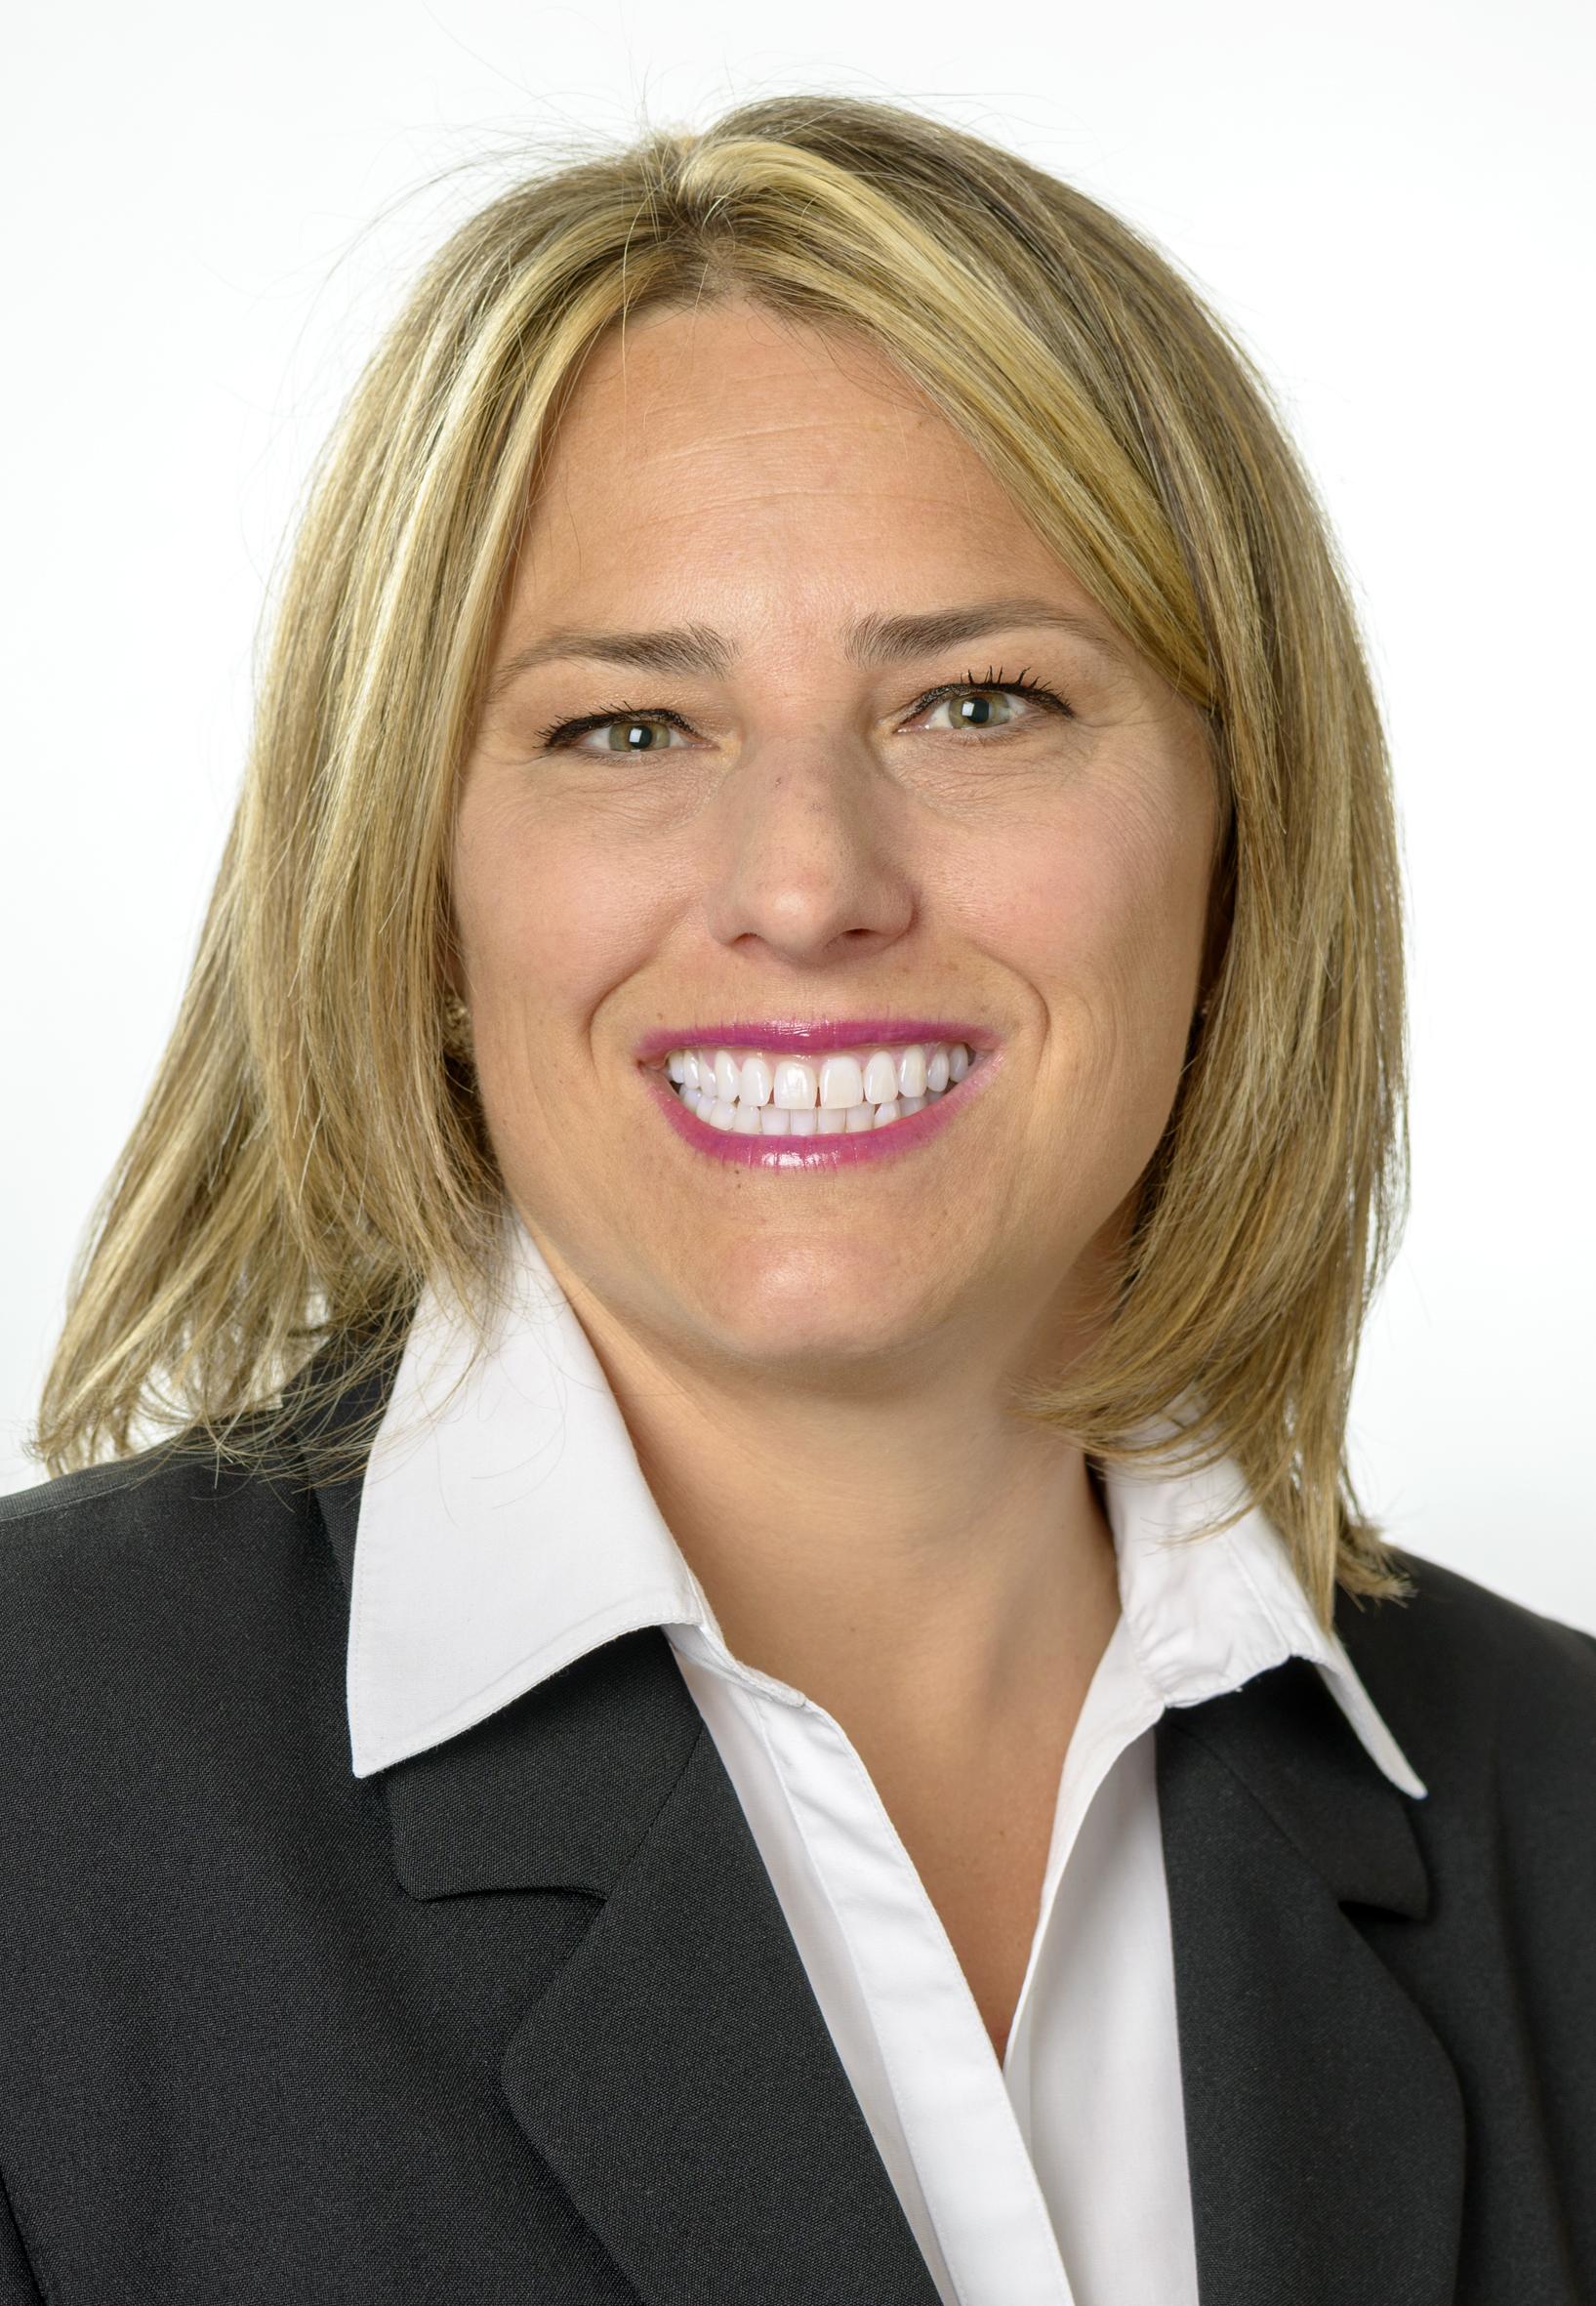 Katja Heiderich